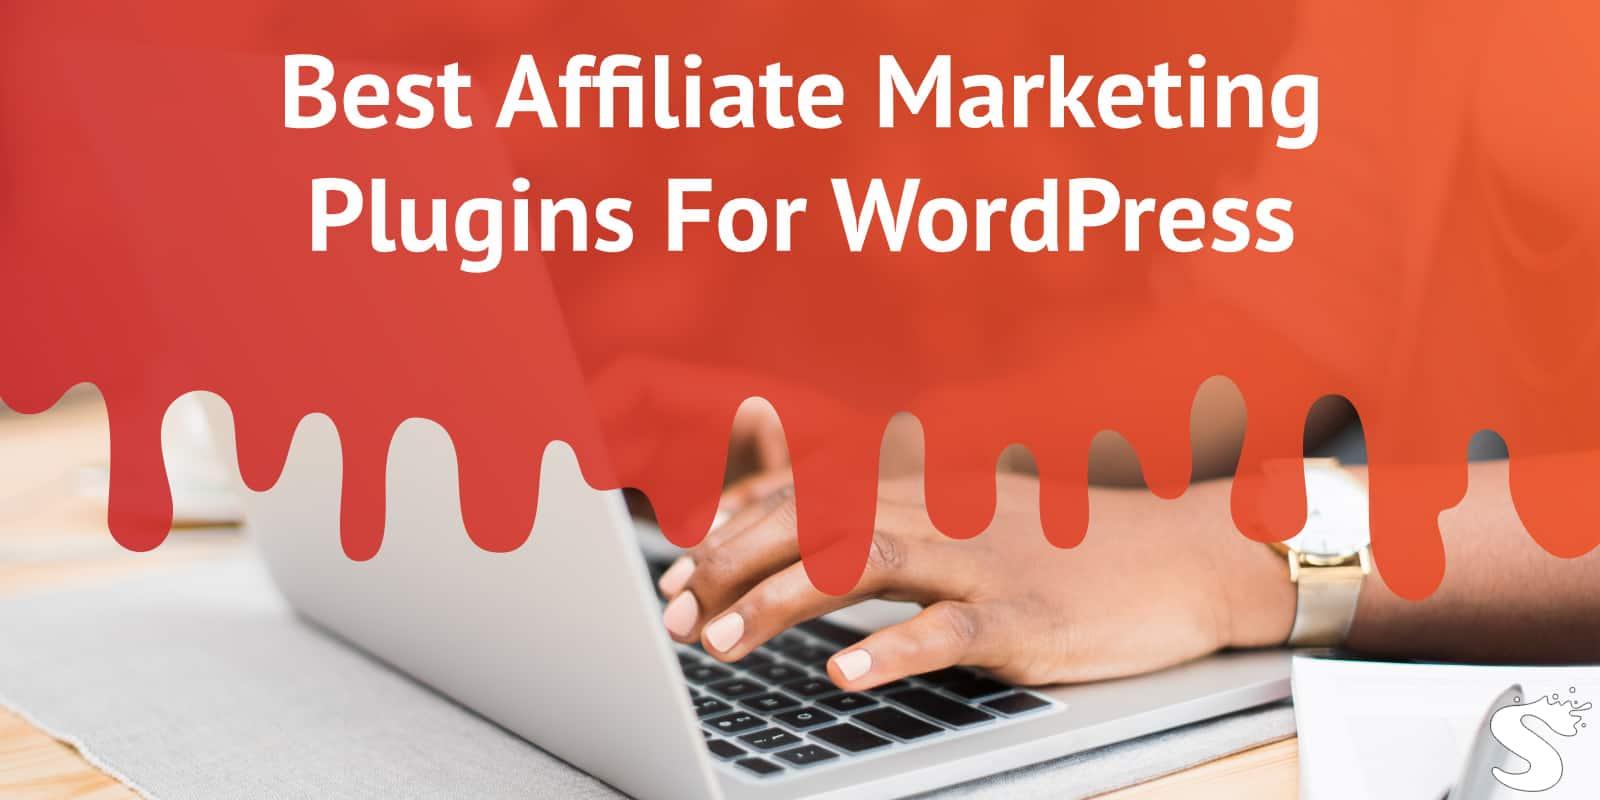 Plugins for Affiliate Marketing